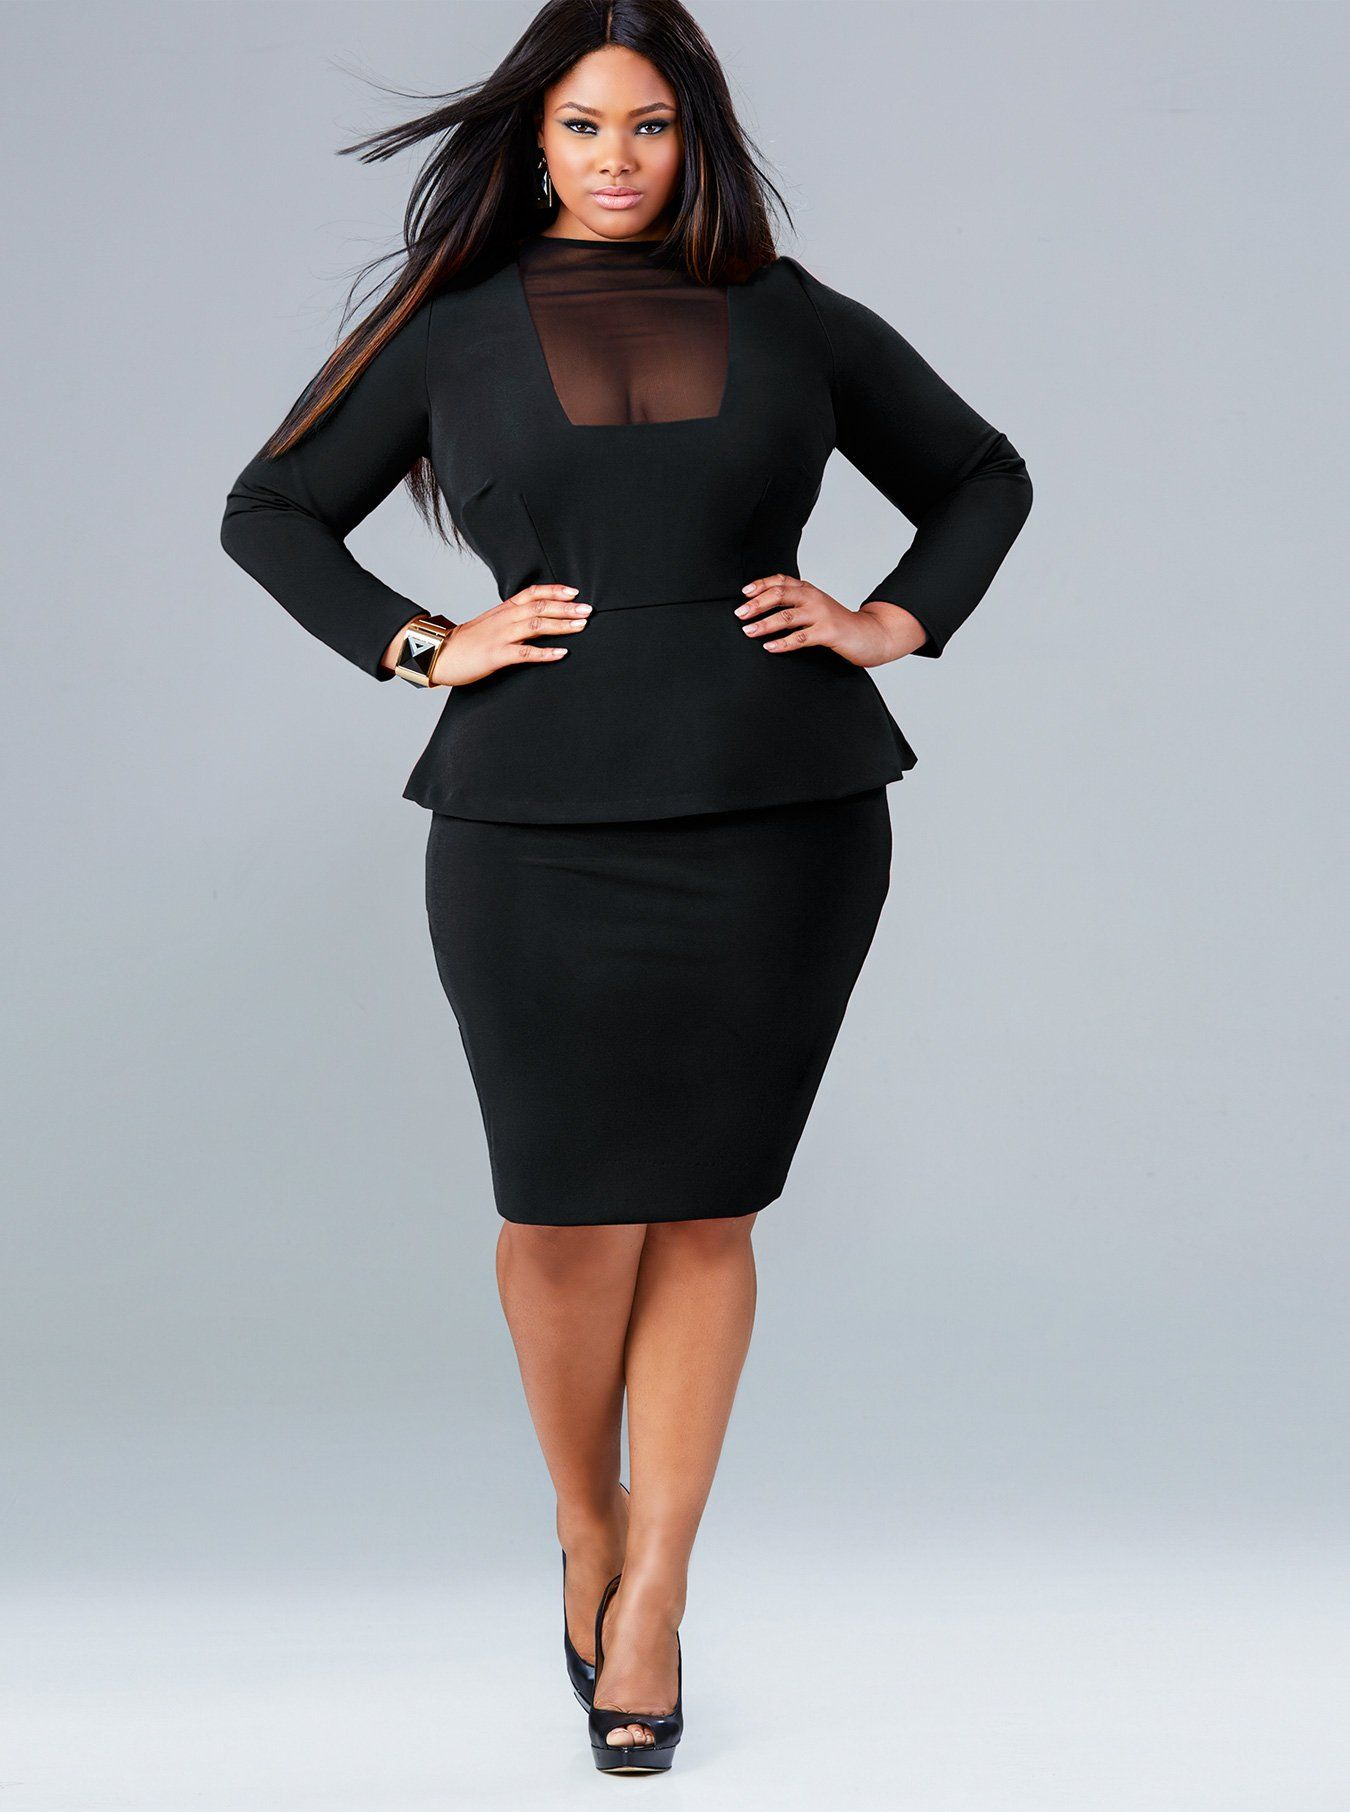 formal black dress plus size gallery - dresses design ideas